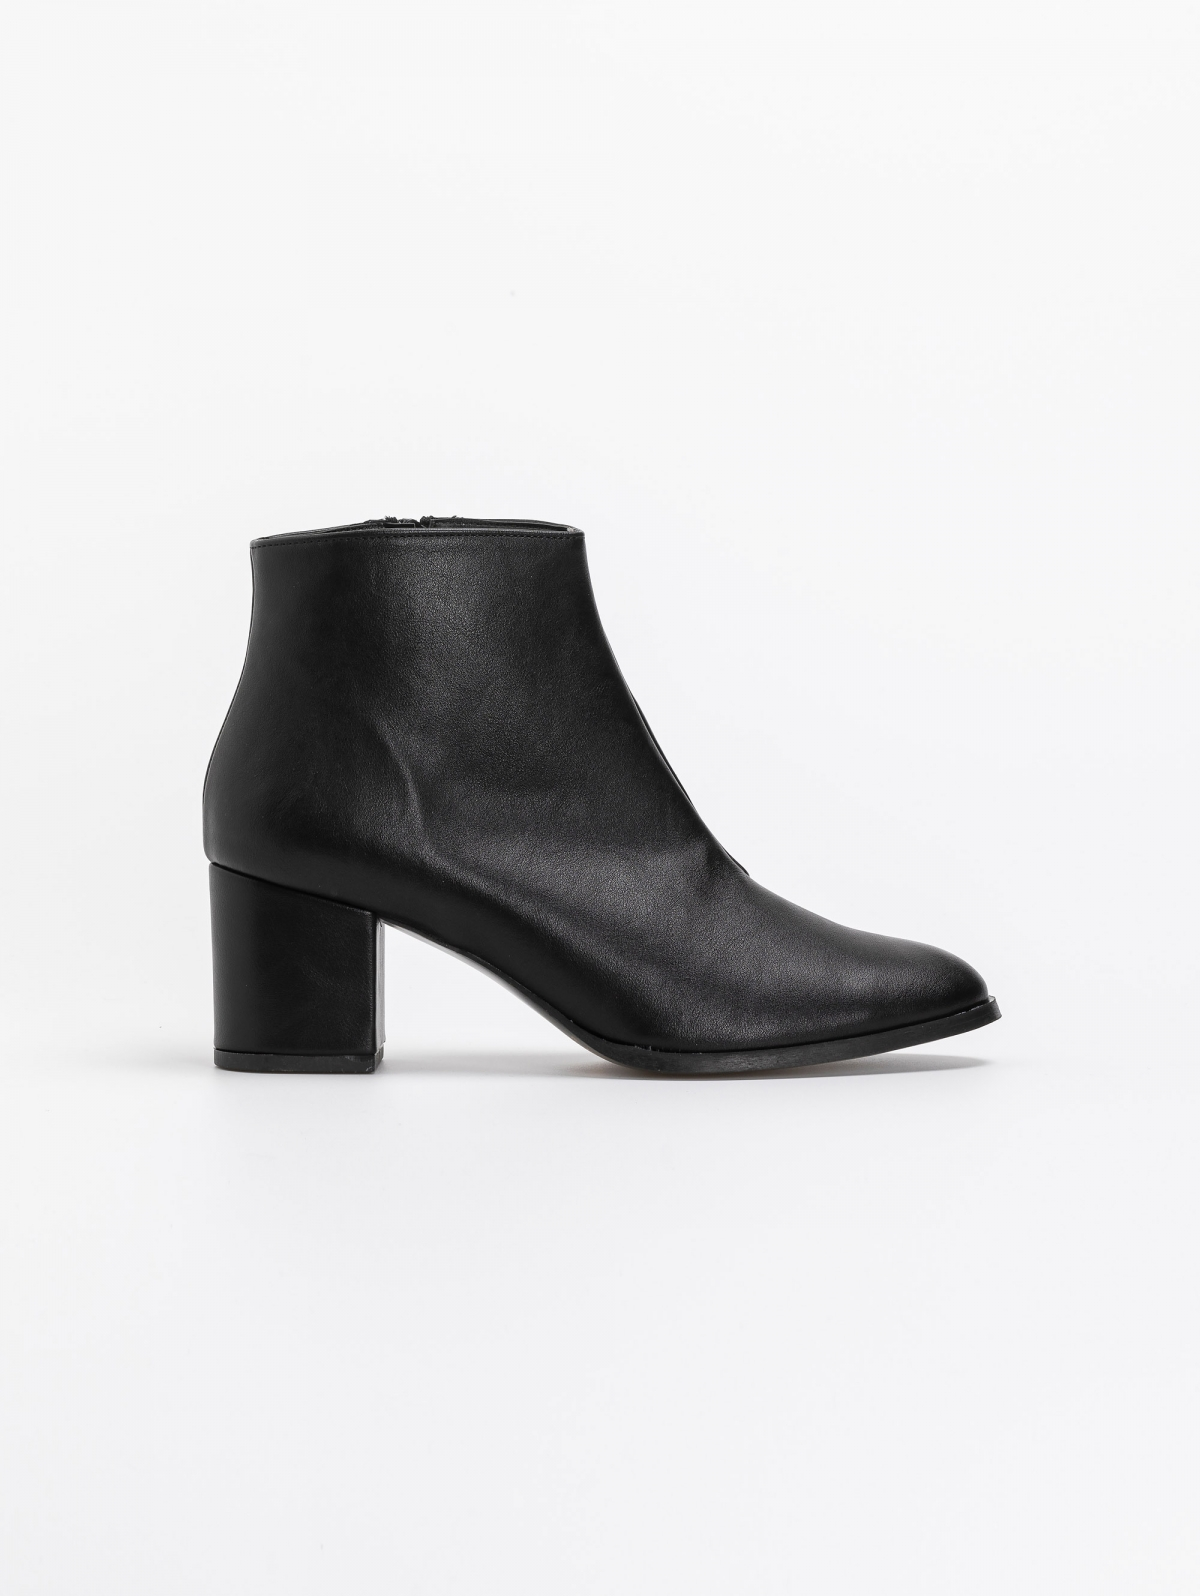 Estil basic ankle boots σε στρογγυλή γραμμή - Μαύρο